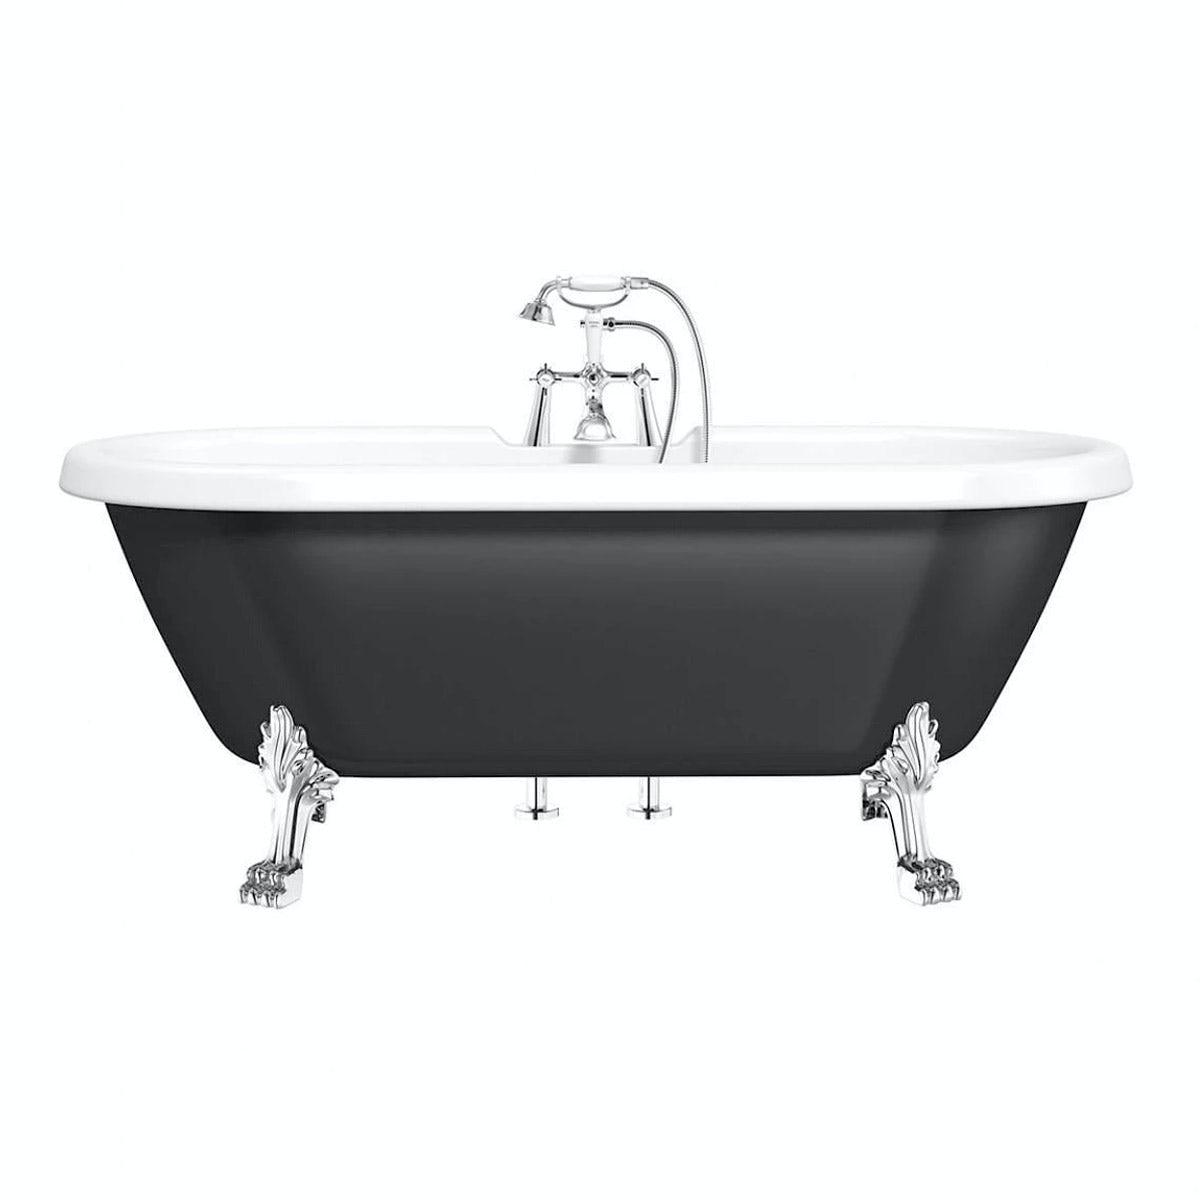 Shakespeare Black Roll Top Bath Waste Victoriaplum Com